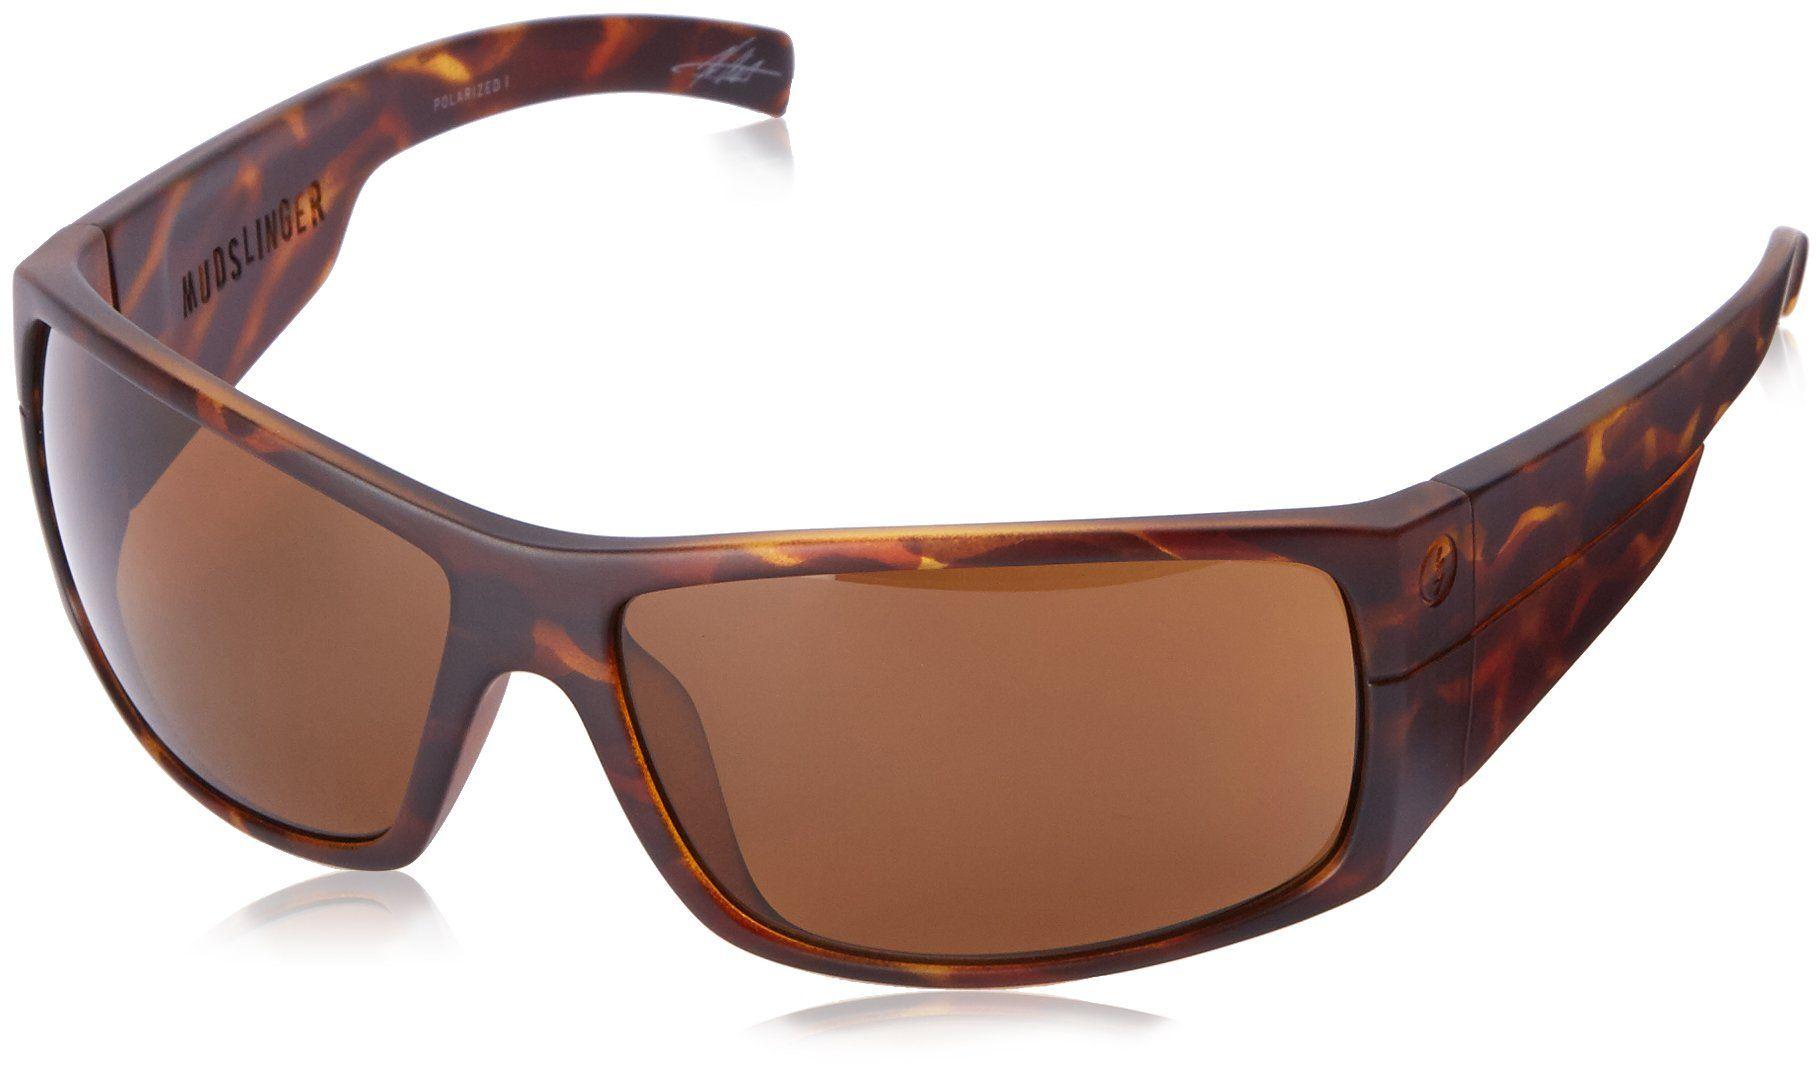 Electric Mudslinger Polarized Wrap Sunglasses, Matte Tort